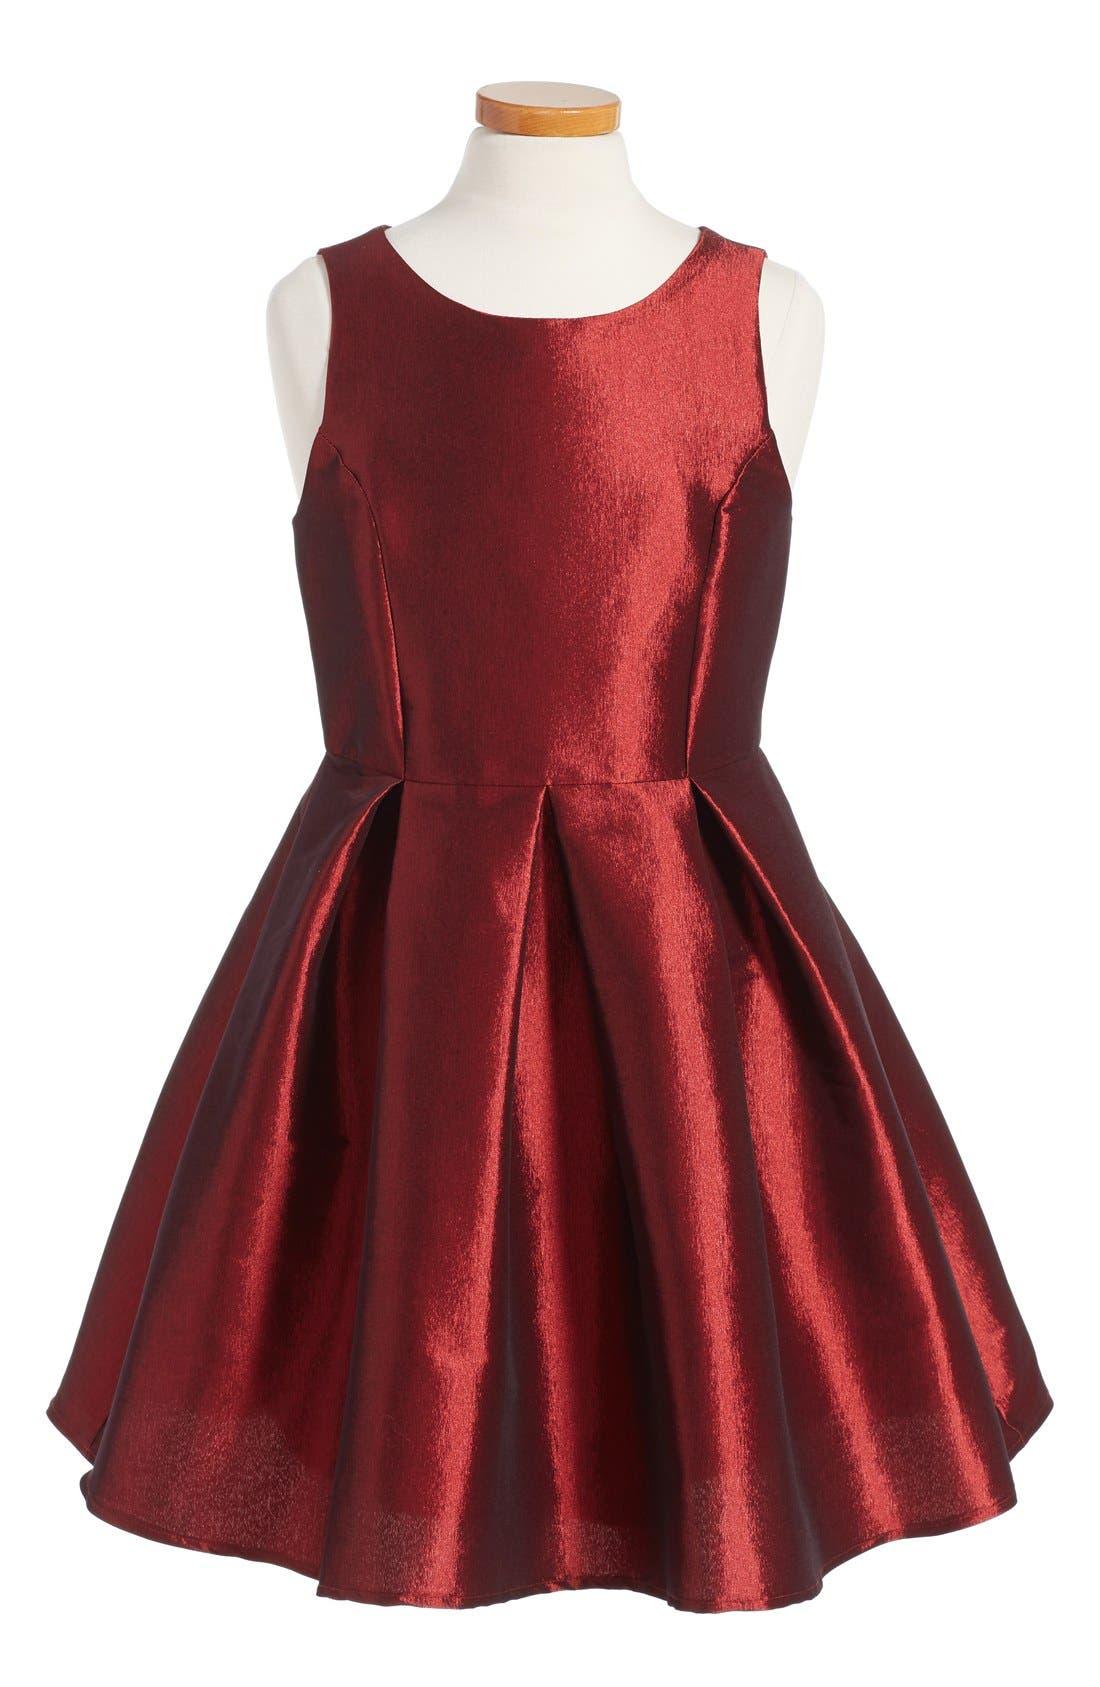 Soprano Sleeveless Skater Dress (Big Girls)